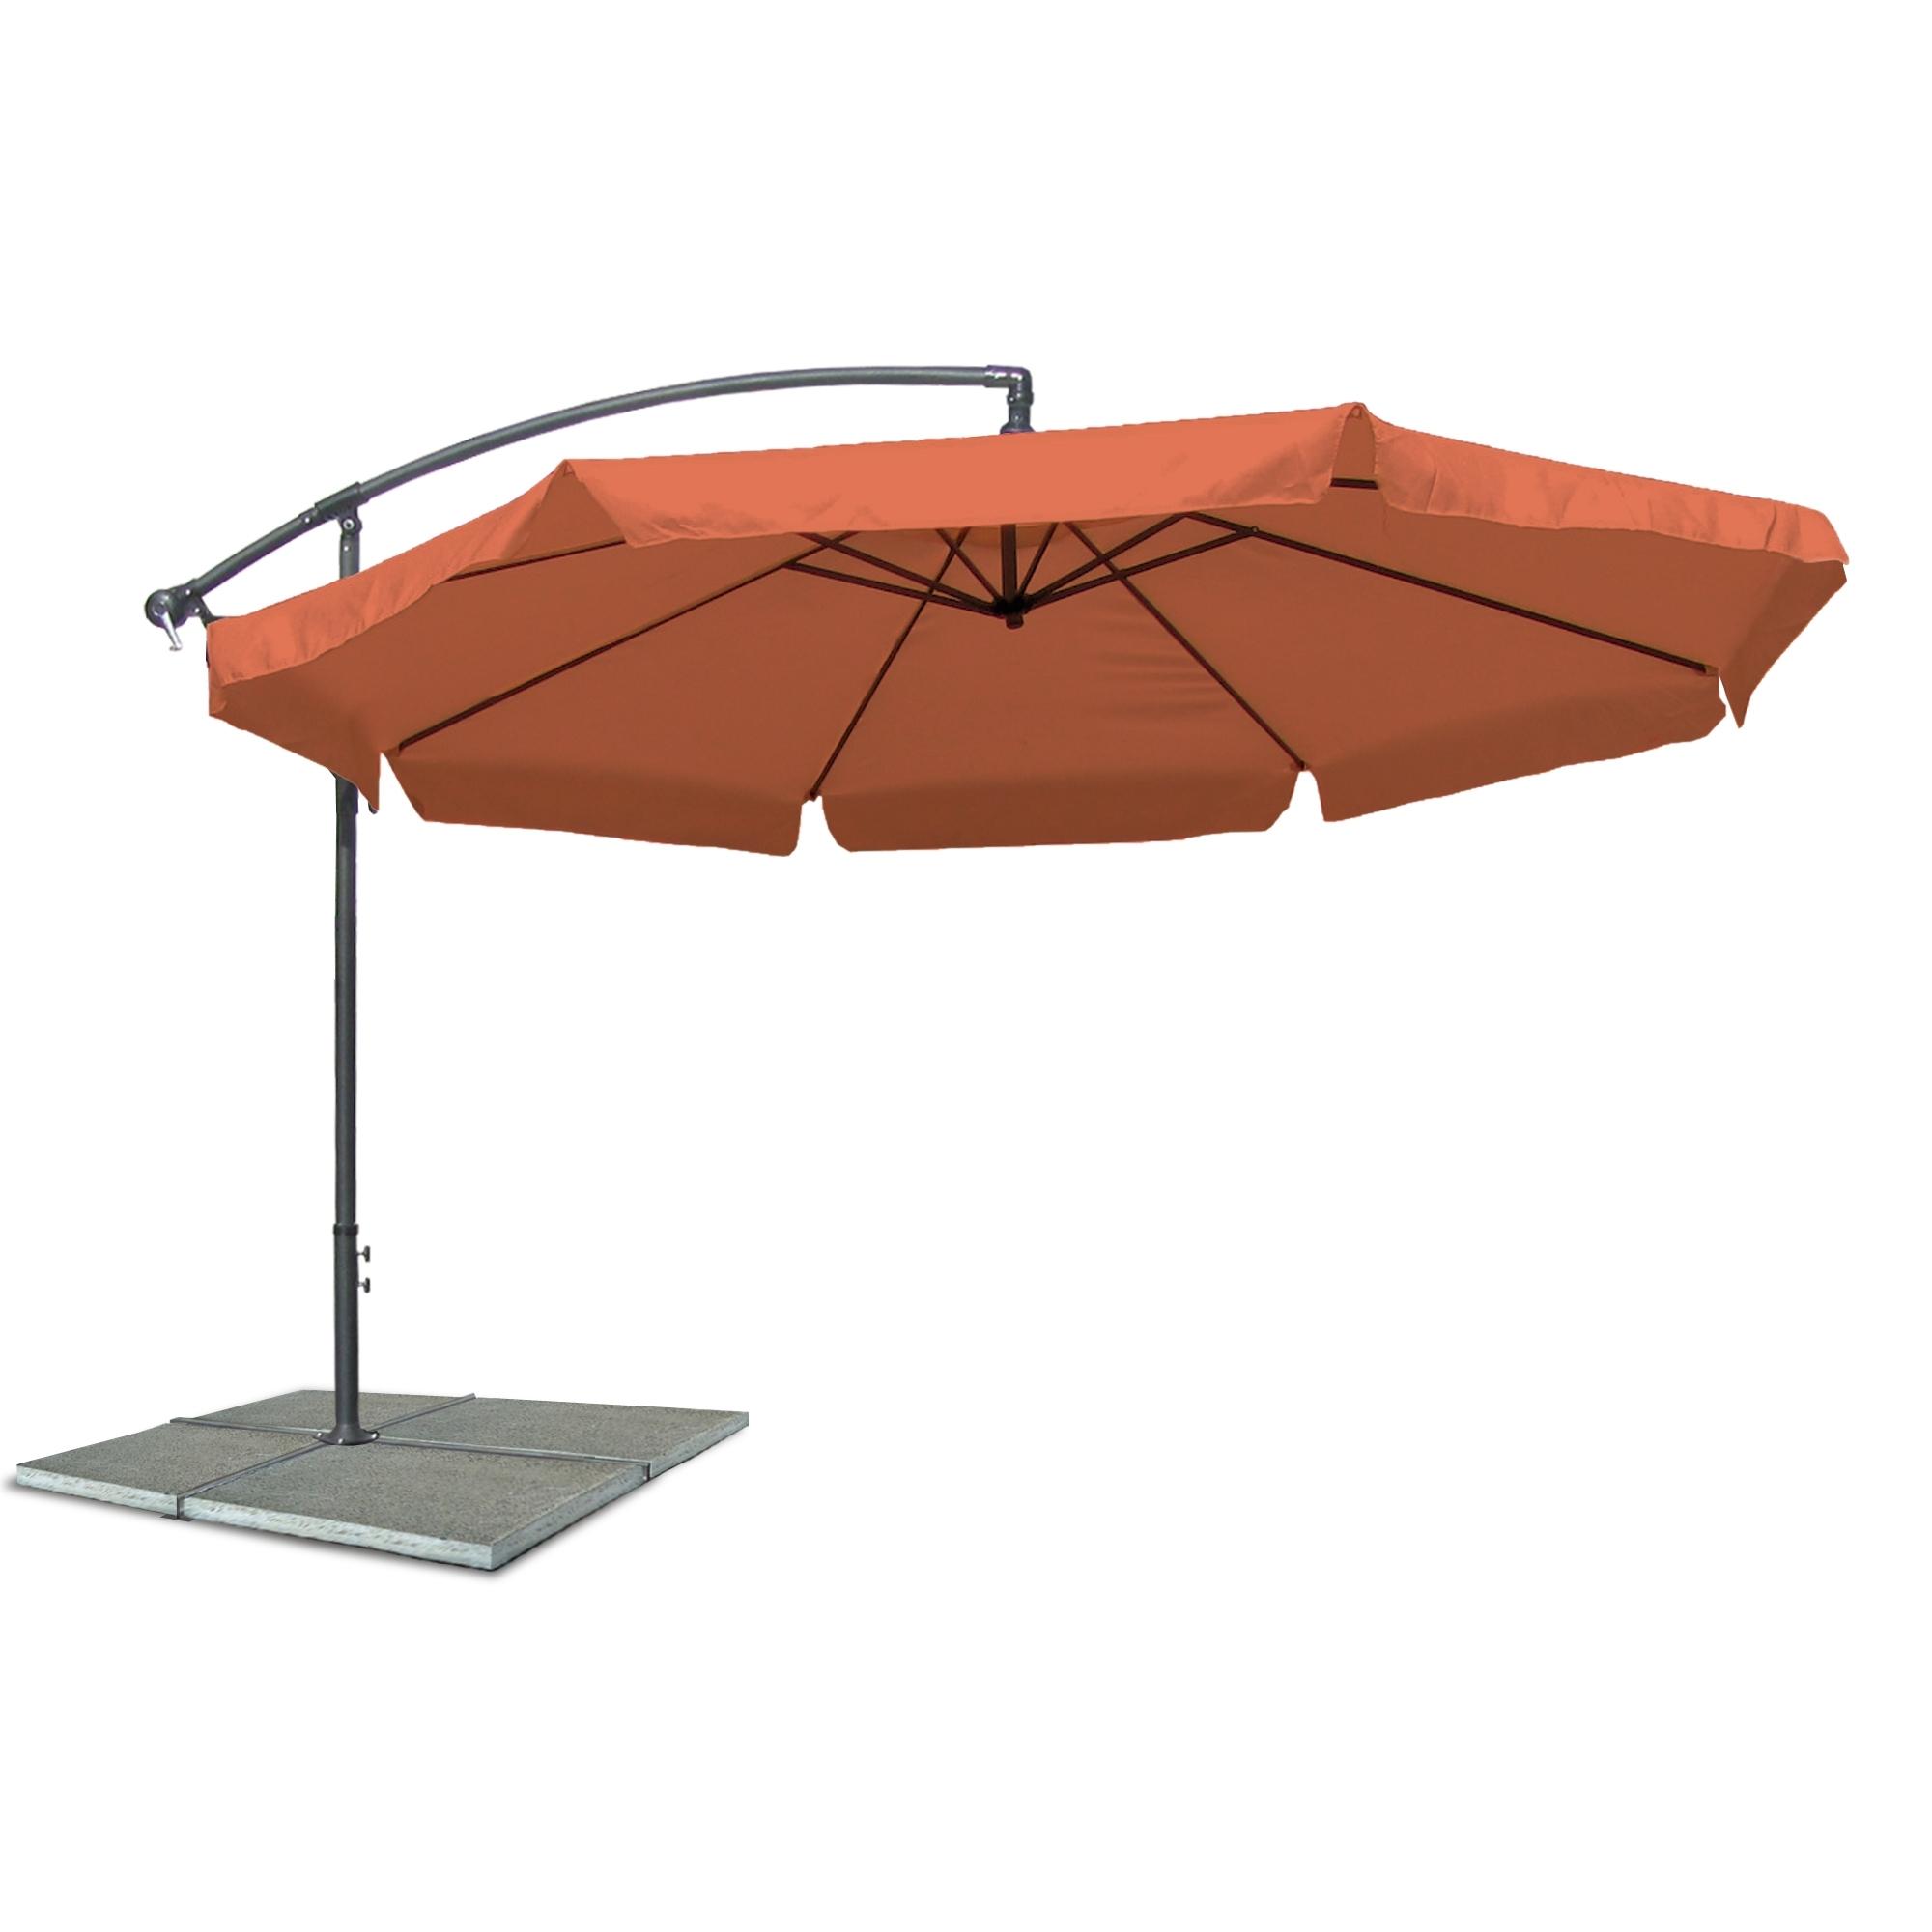 ampelschirm sonnenschirm mit 300 cm durchmesser in terracotta material polyester 160g. Black Bedroom Furniture Sets. Home Design Ideas